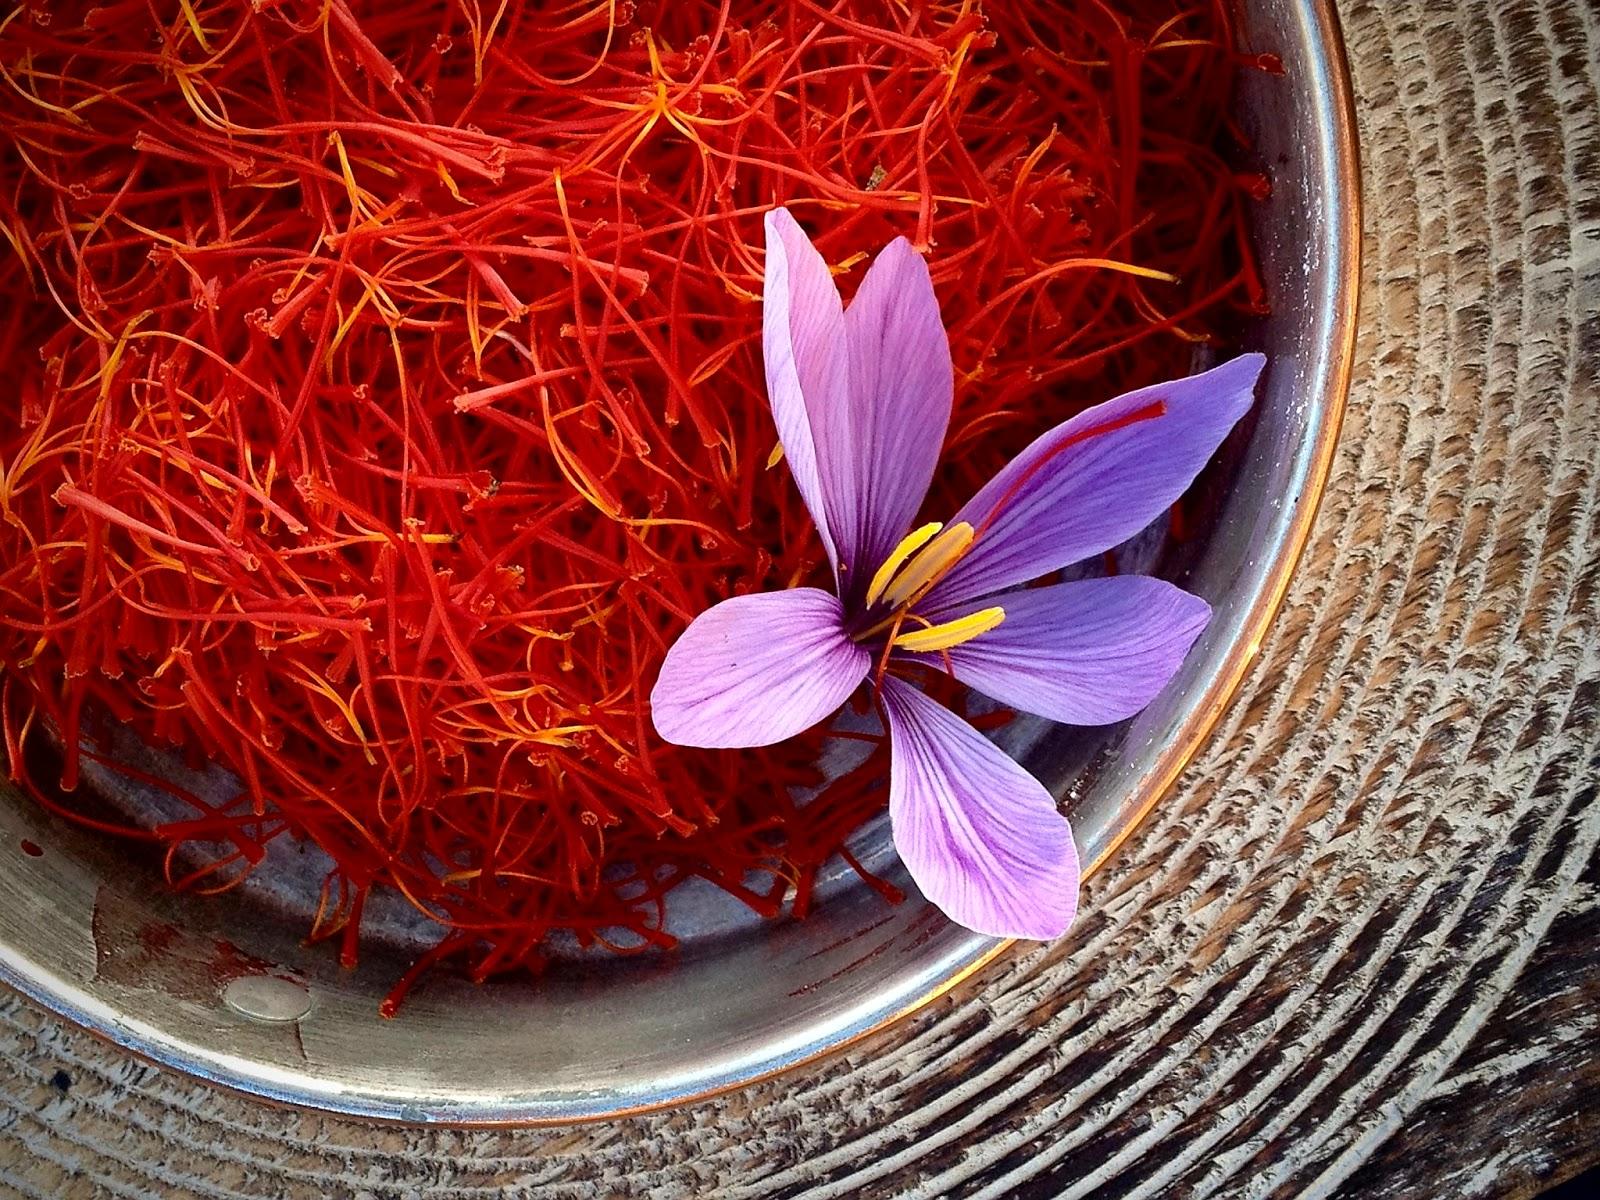 wellness ayurveda: interesting benefits of golden spice